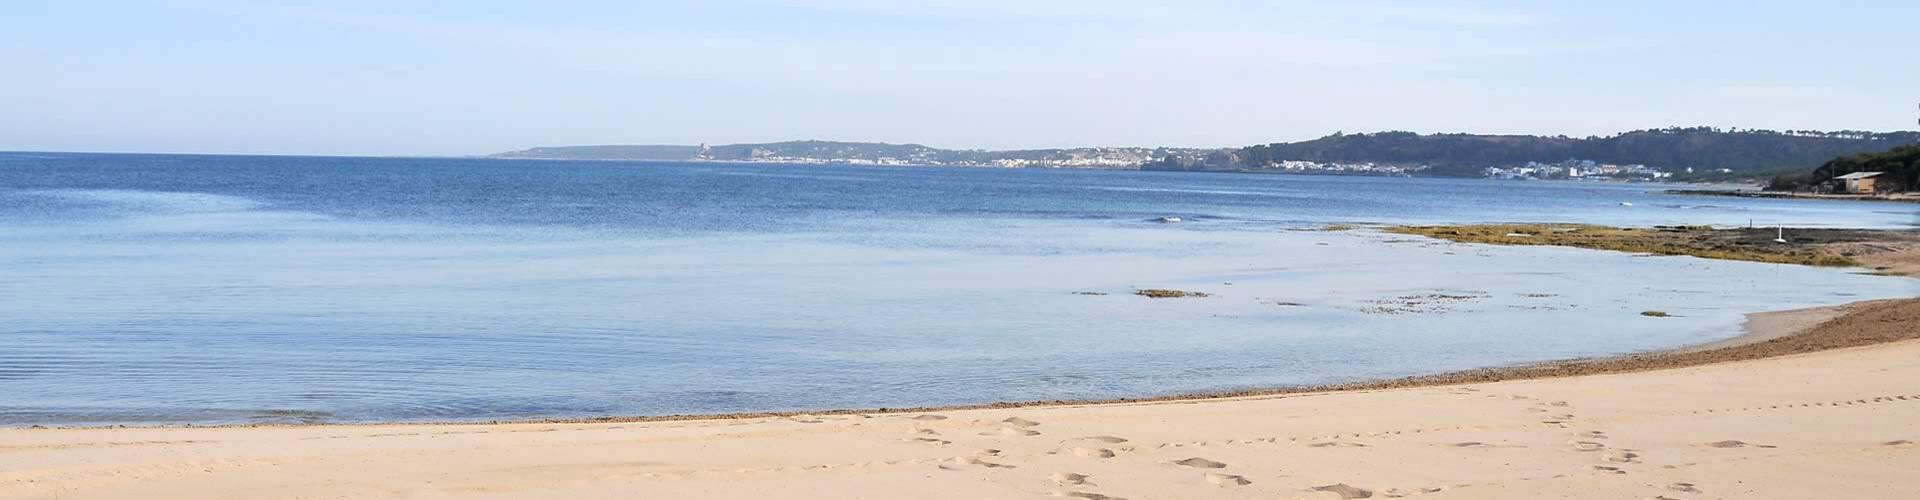 lavecchiatorregallipoli en the-beach 008